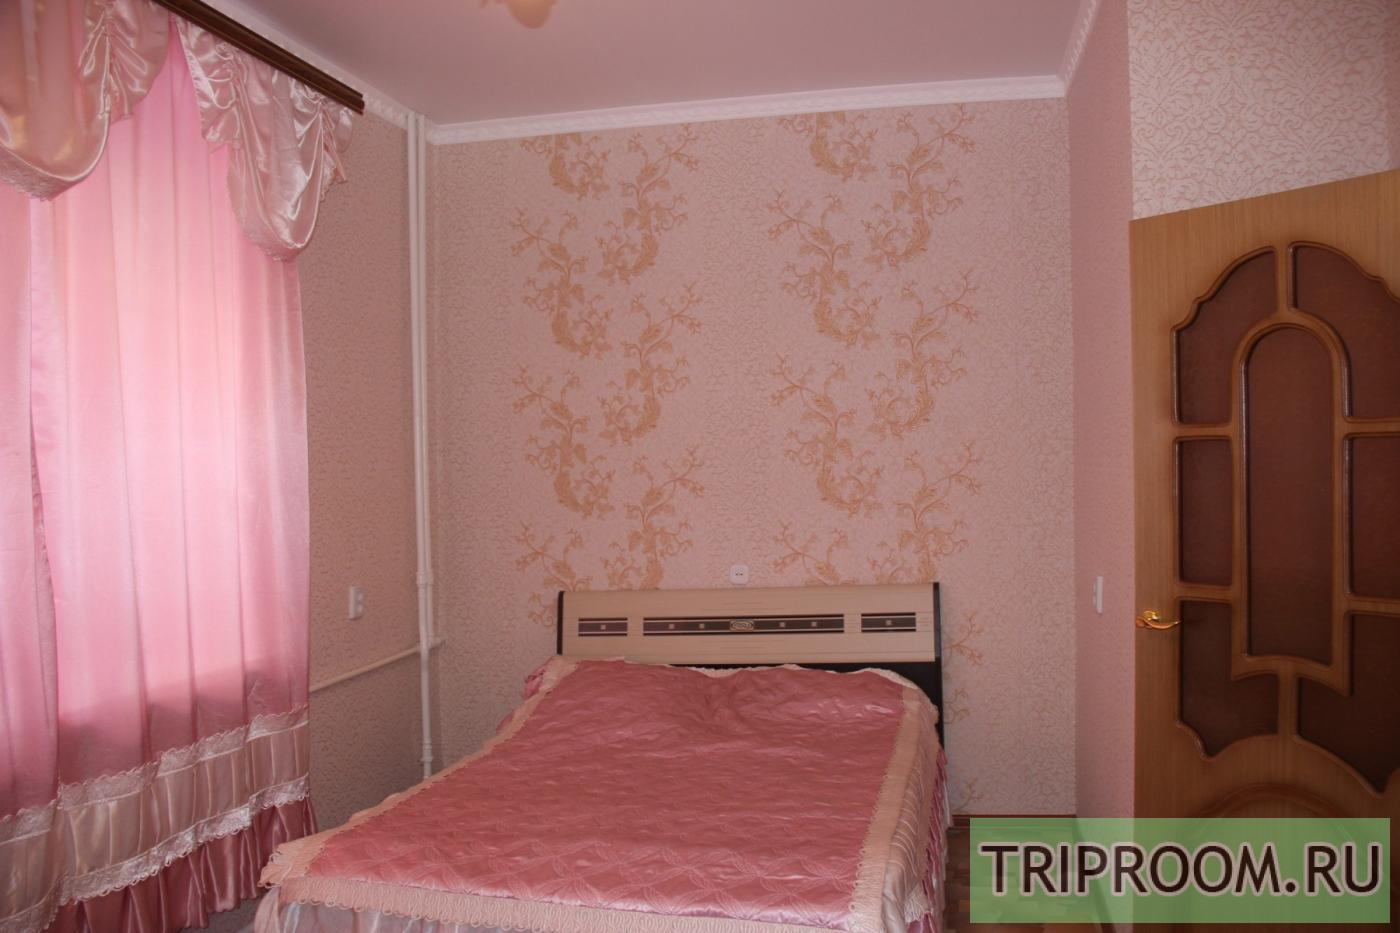 1-комнатная квартира посуточно (вариант № 4690), ул. Пушкинская улица, фото № 1